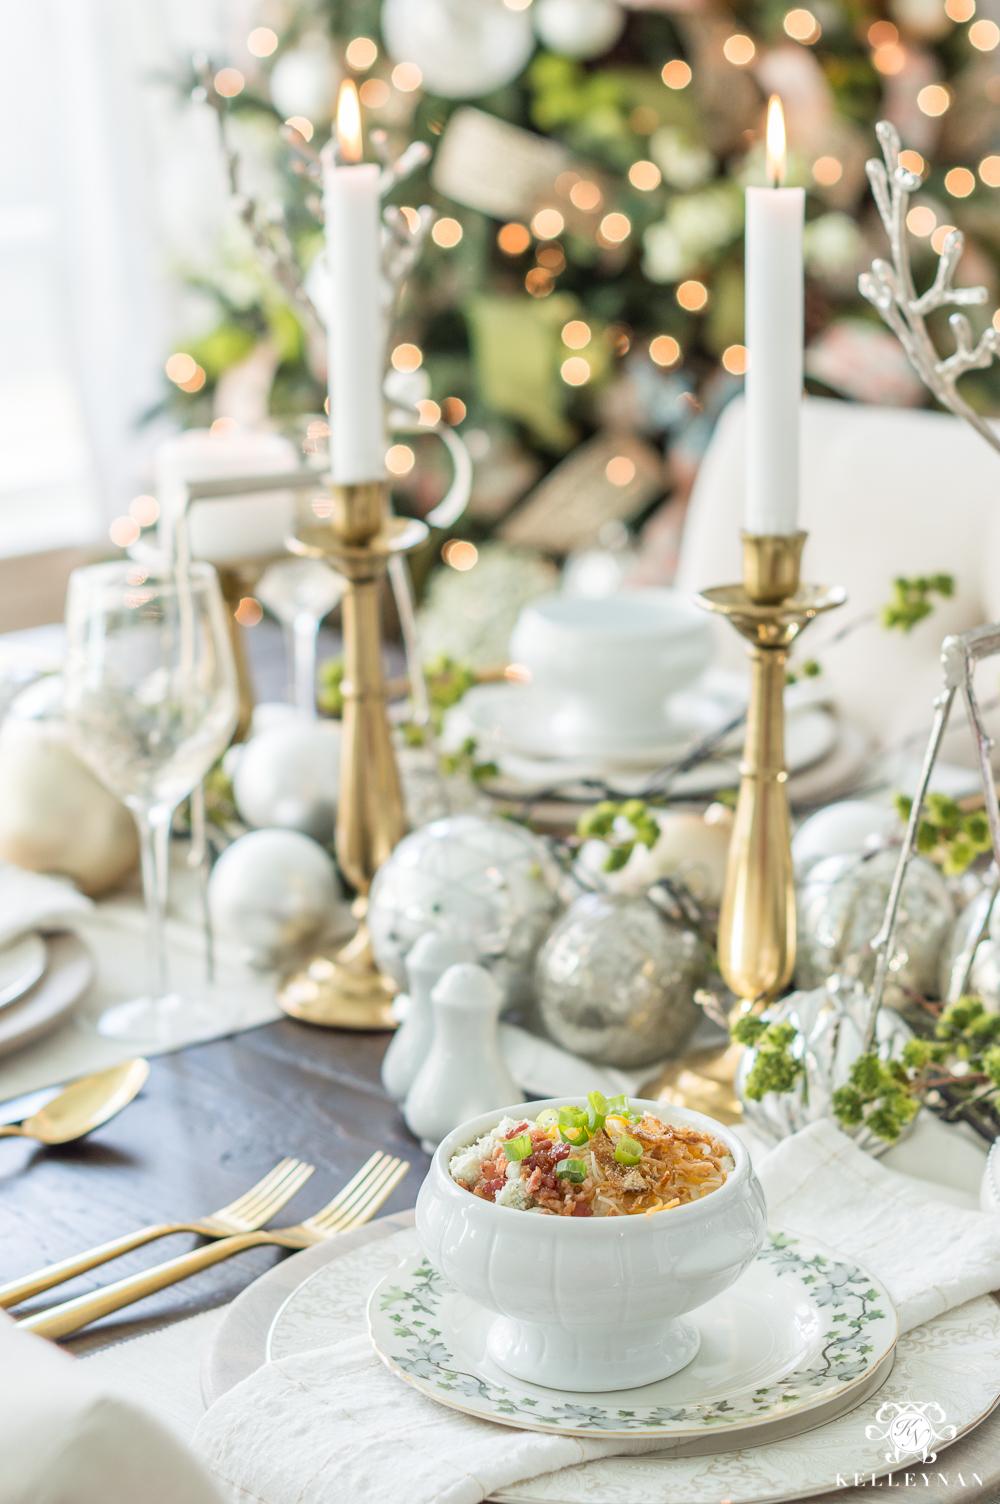 Christmas table ideas for the holidays